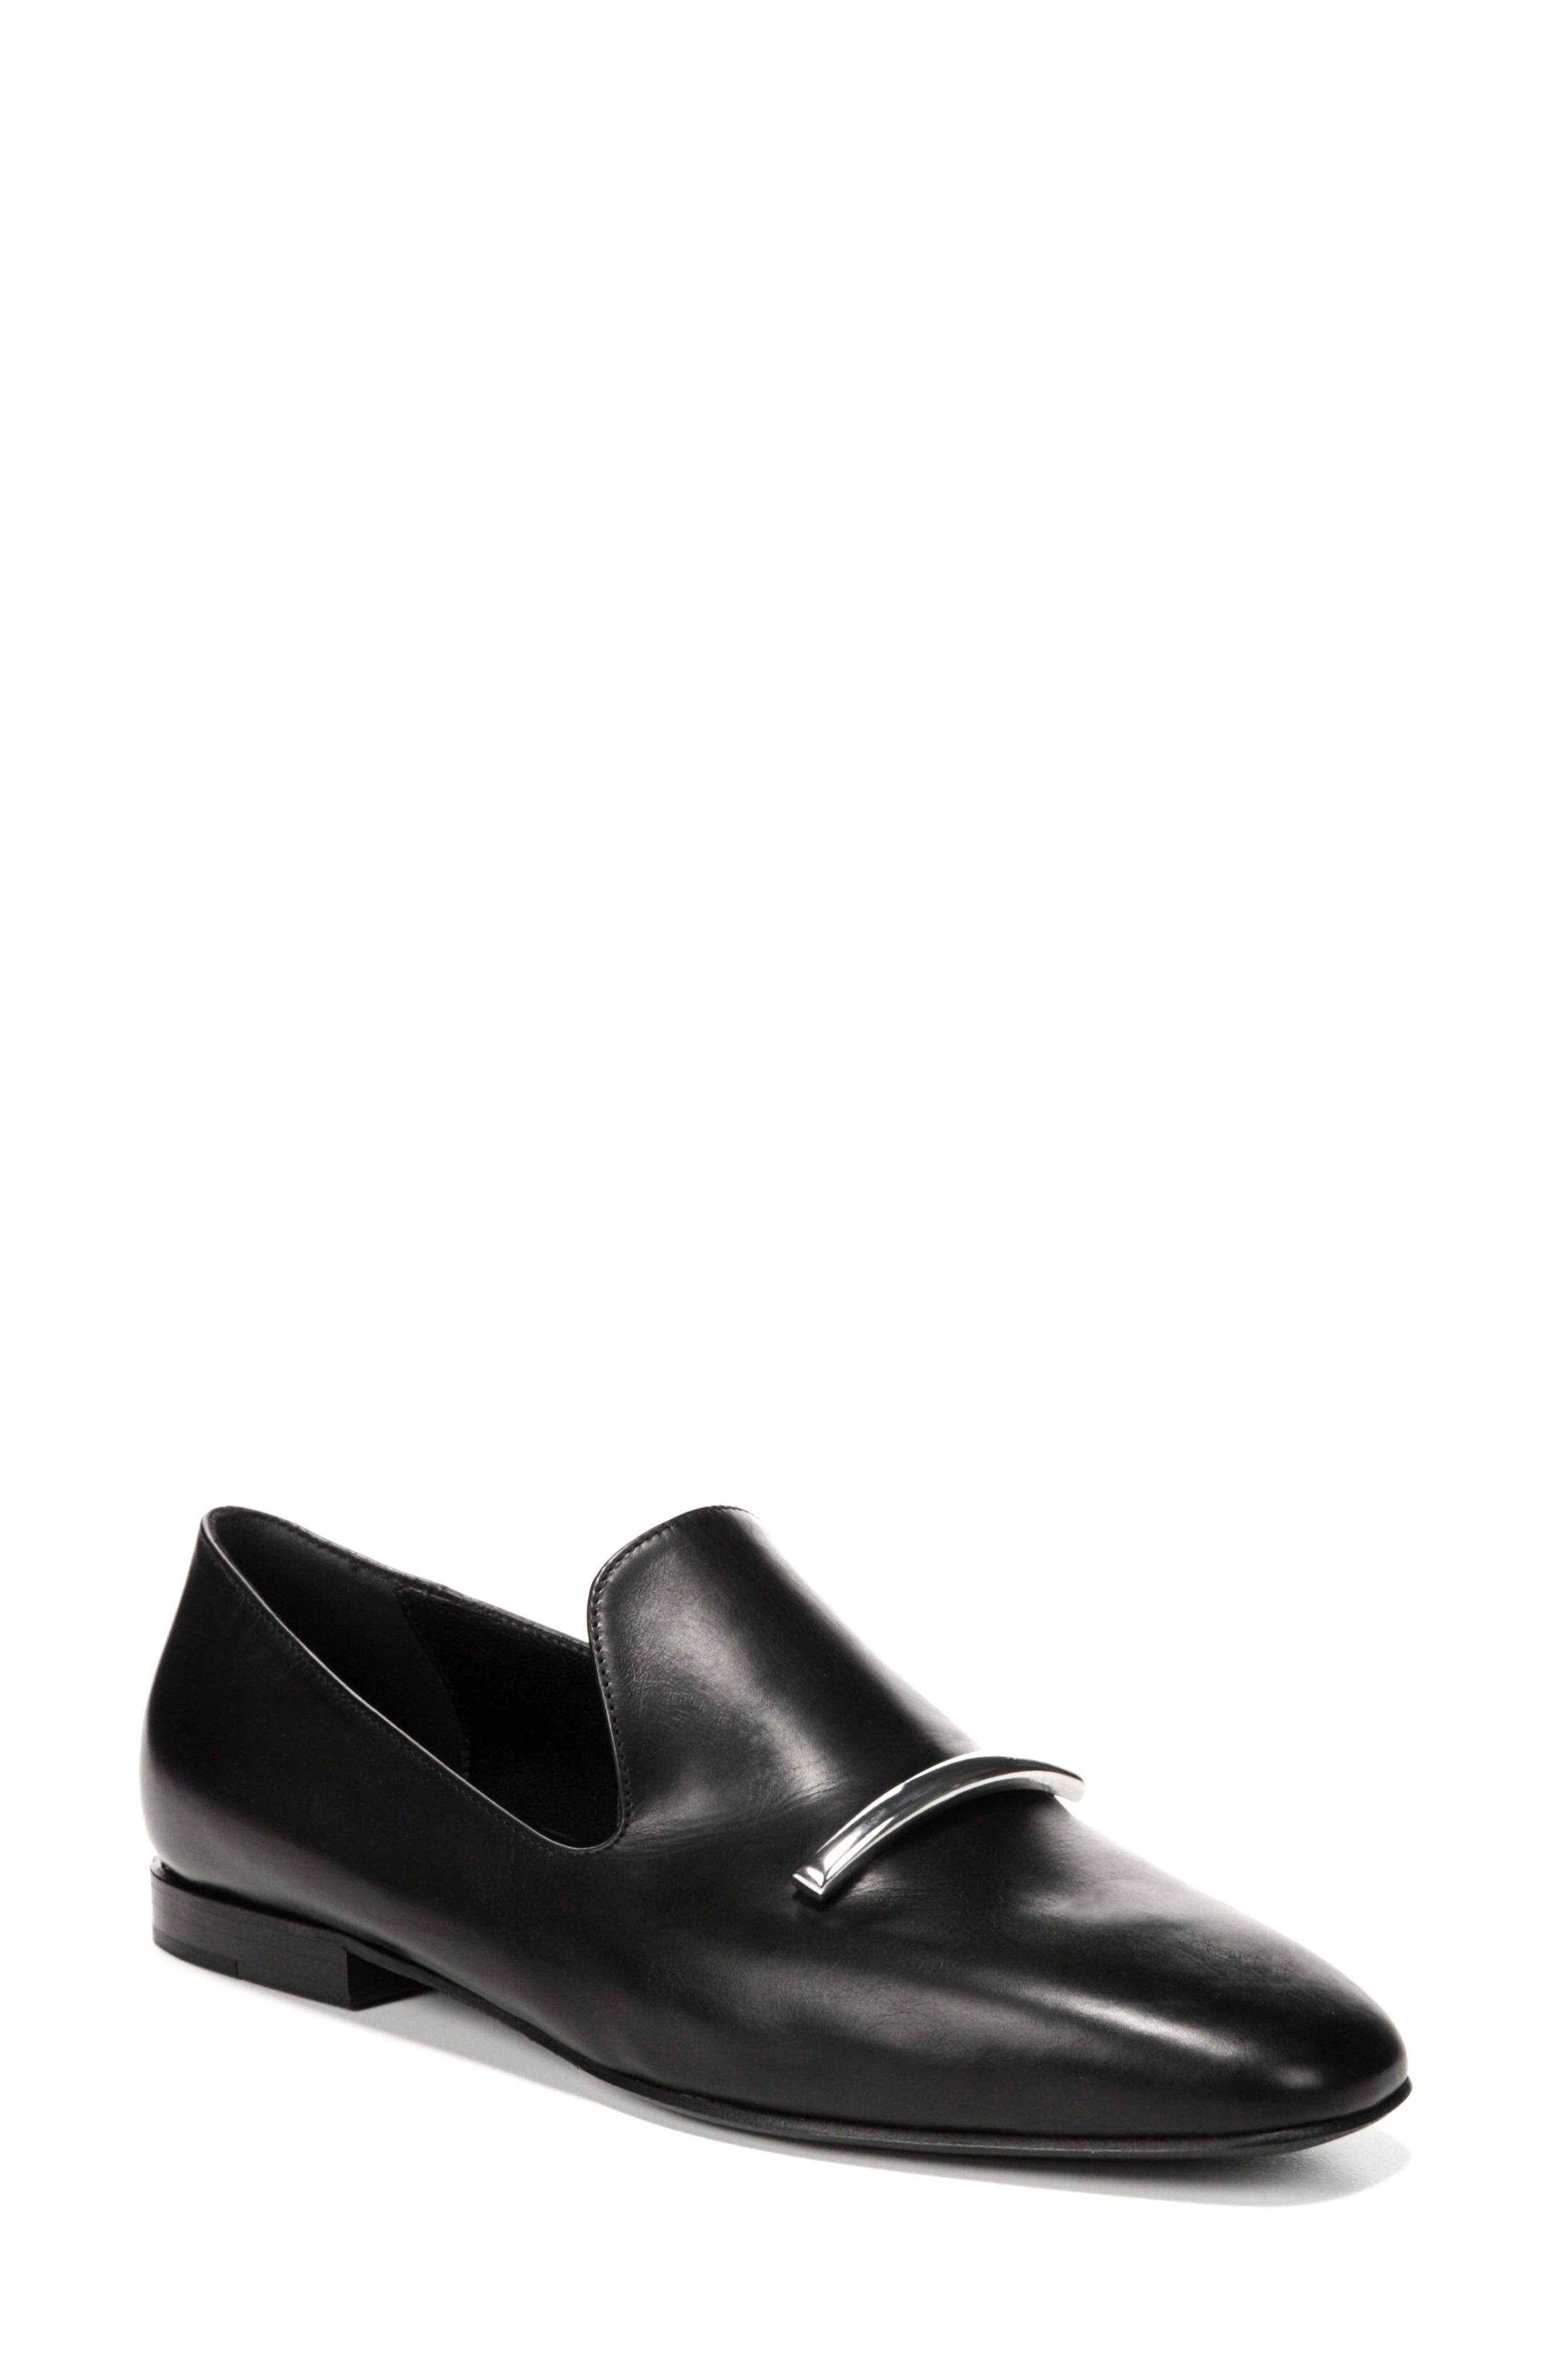 Alternate Image 1 Selected - Via Spiga Tallis Flat Loafer (Women)